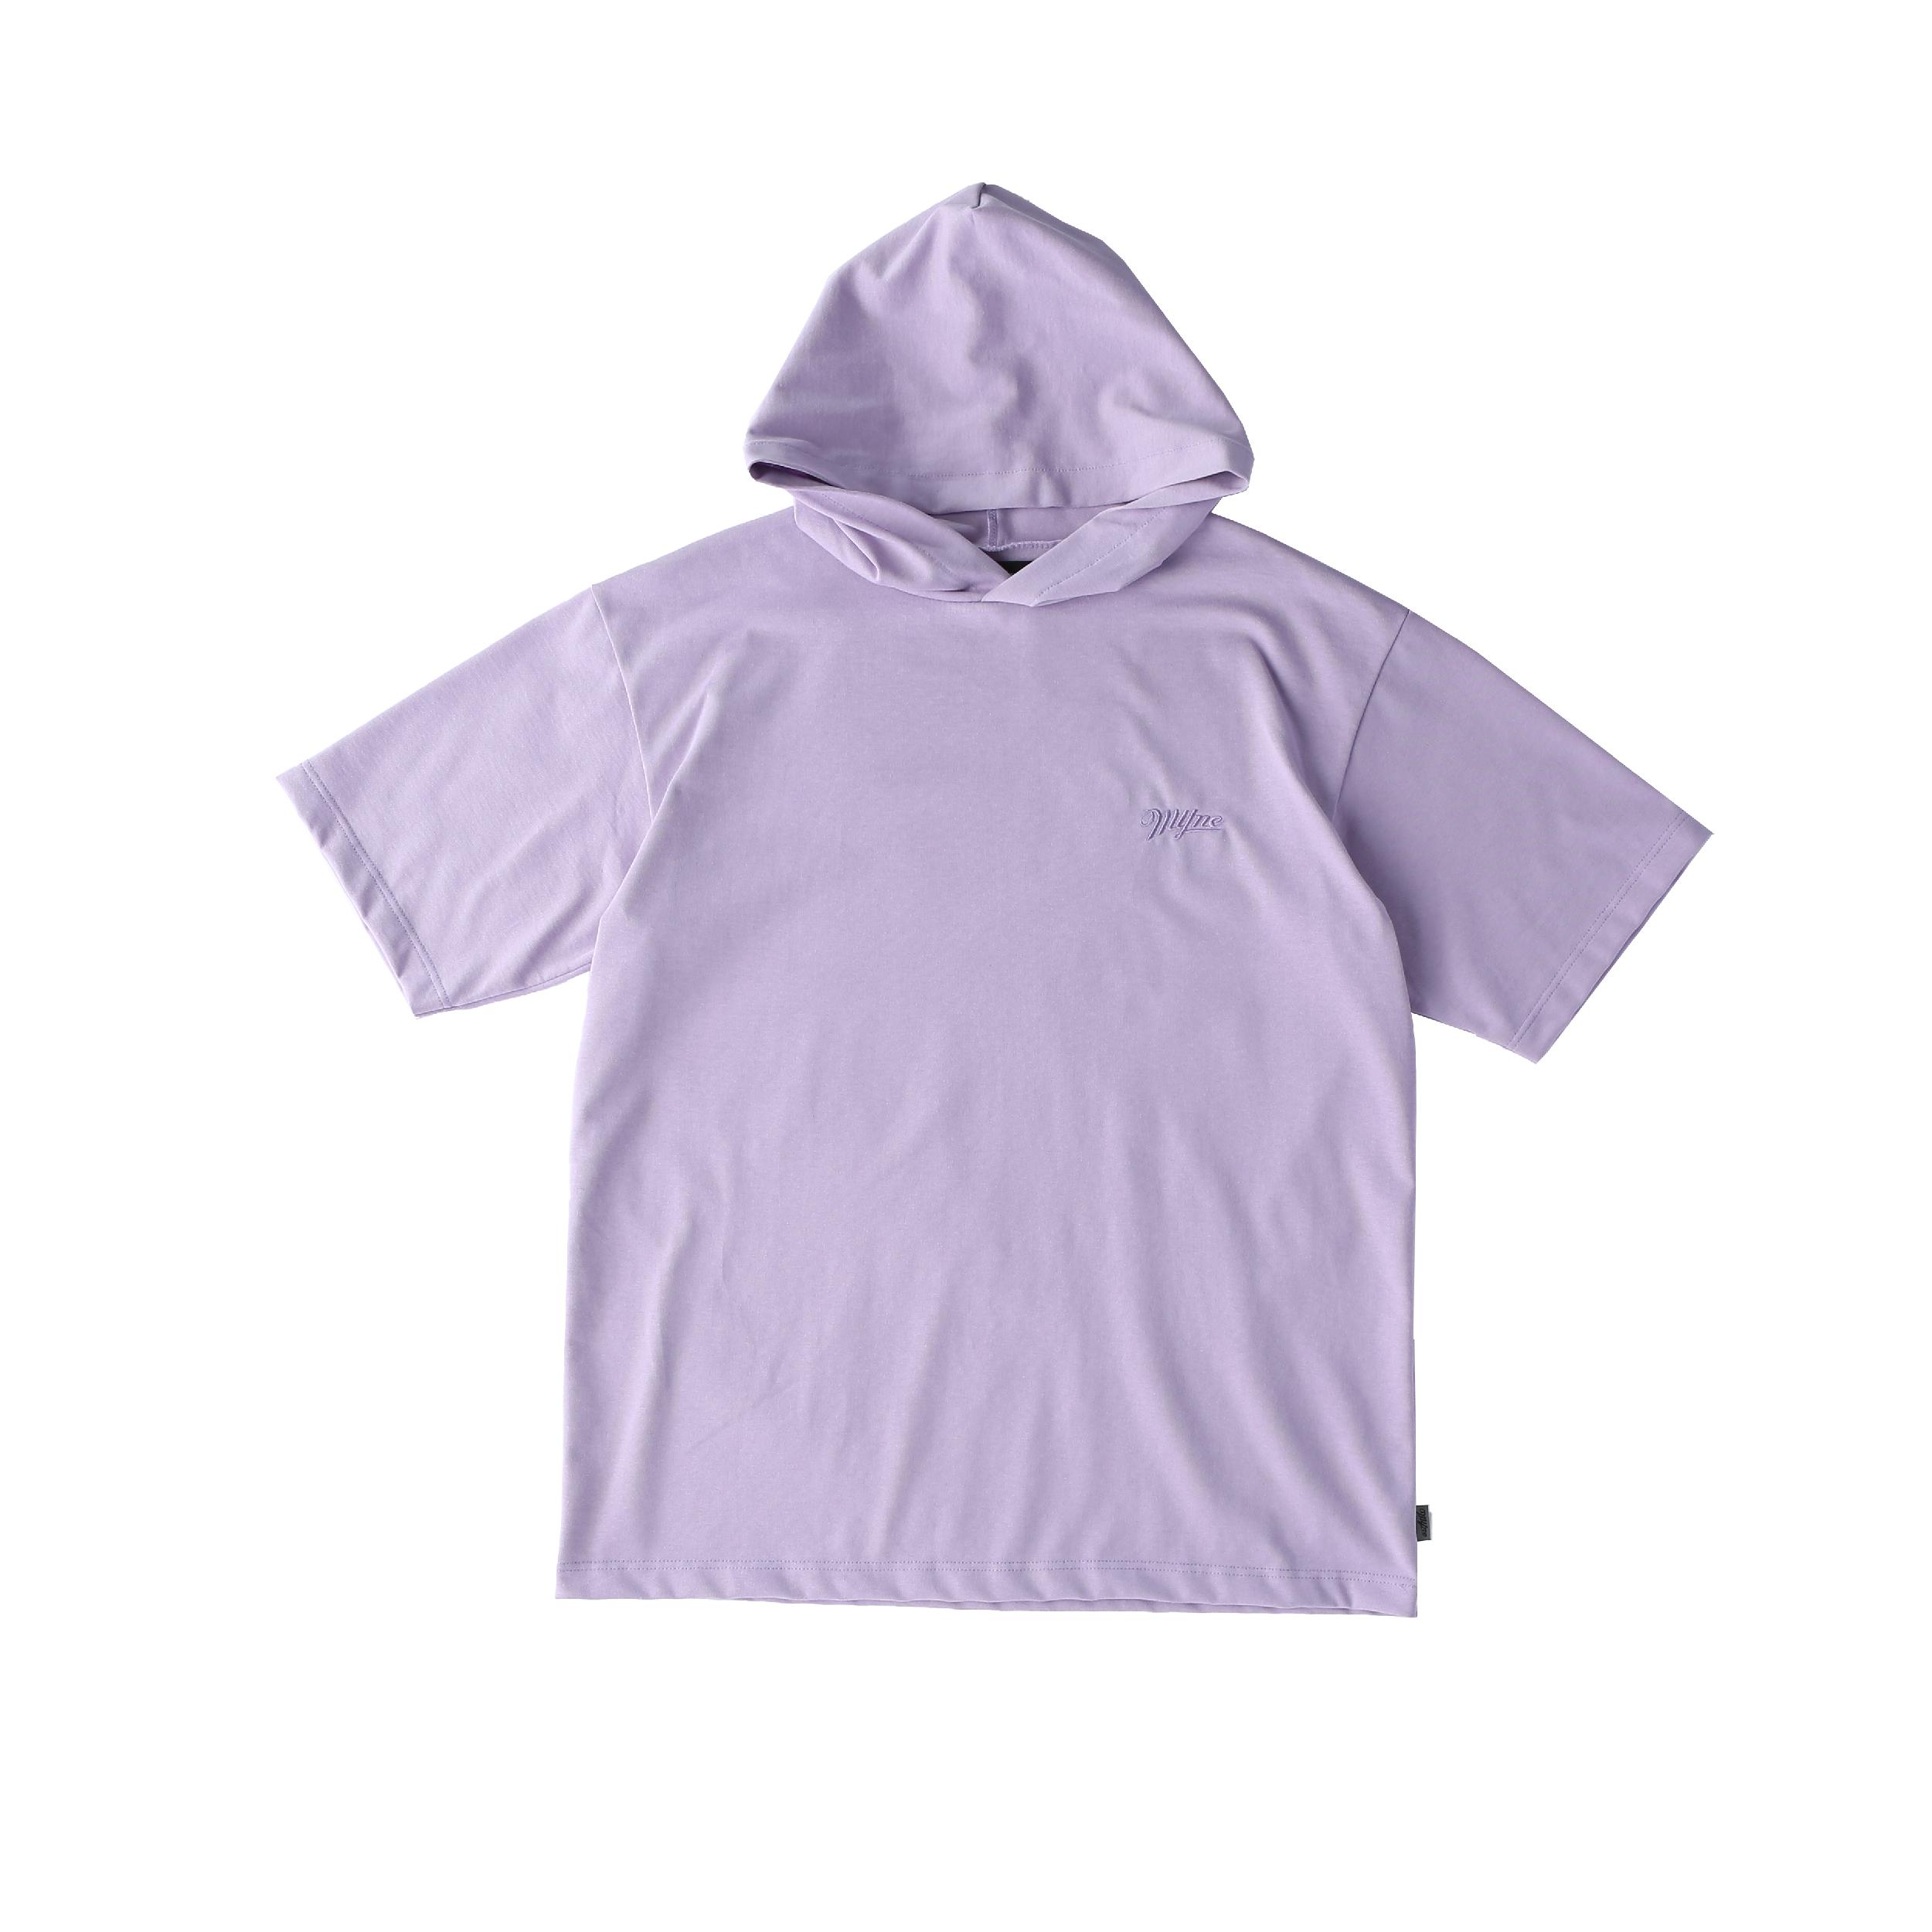 SNATCHER hoodie T-shirt / PURPLE - 画像1